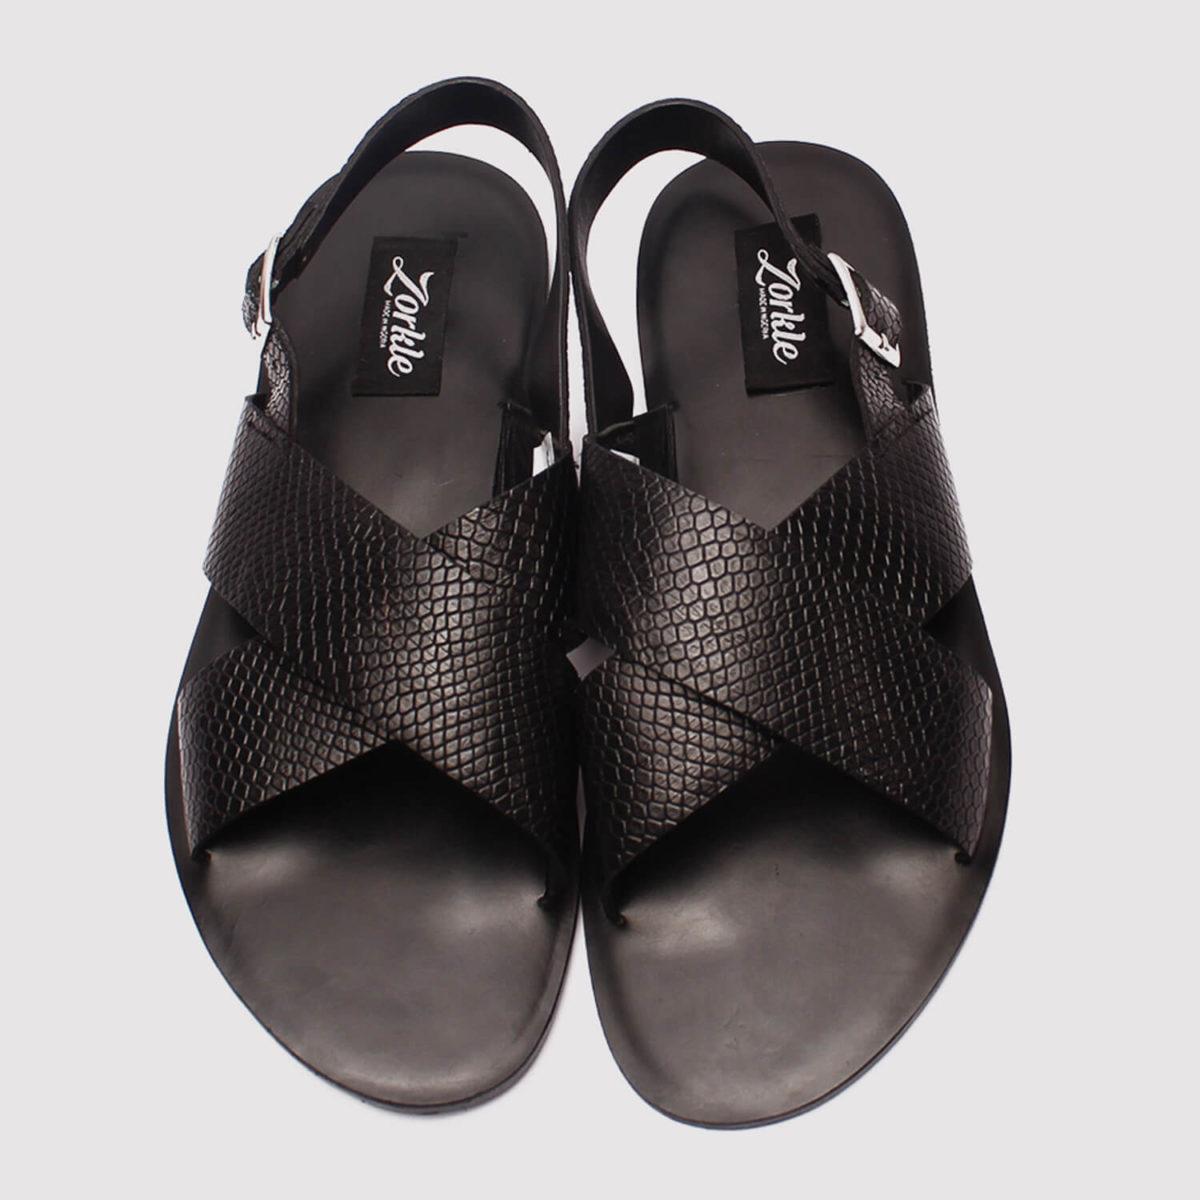 hafred sandals black leather zorkle shoes lagos nigeria